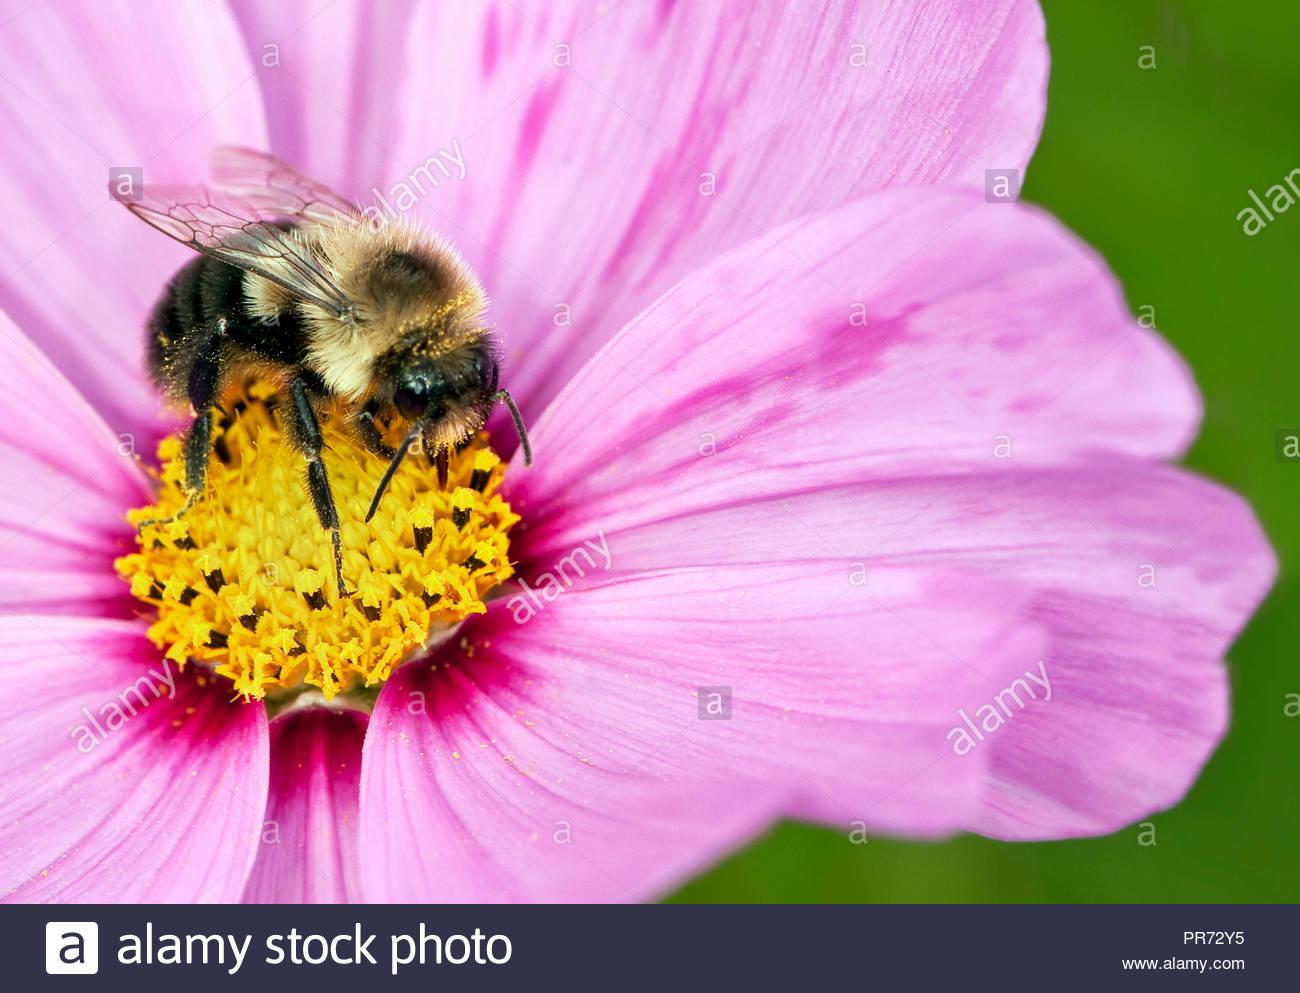 Makroaufnahme der Hummel auf rosa Blume Stockbild